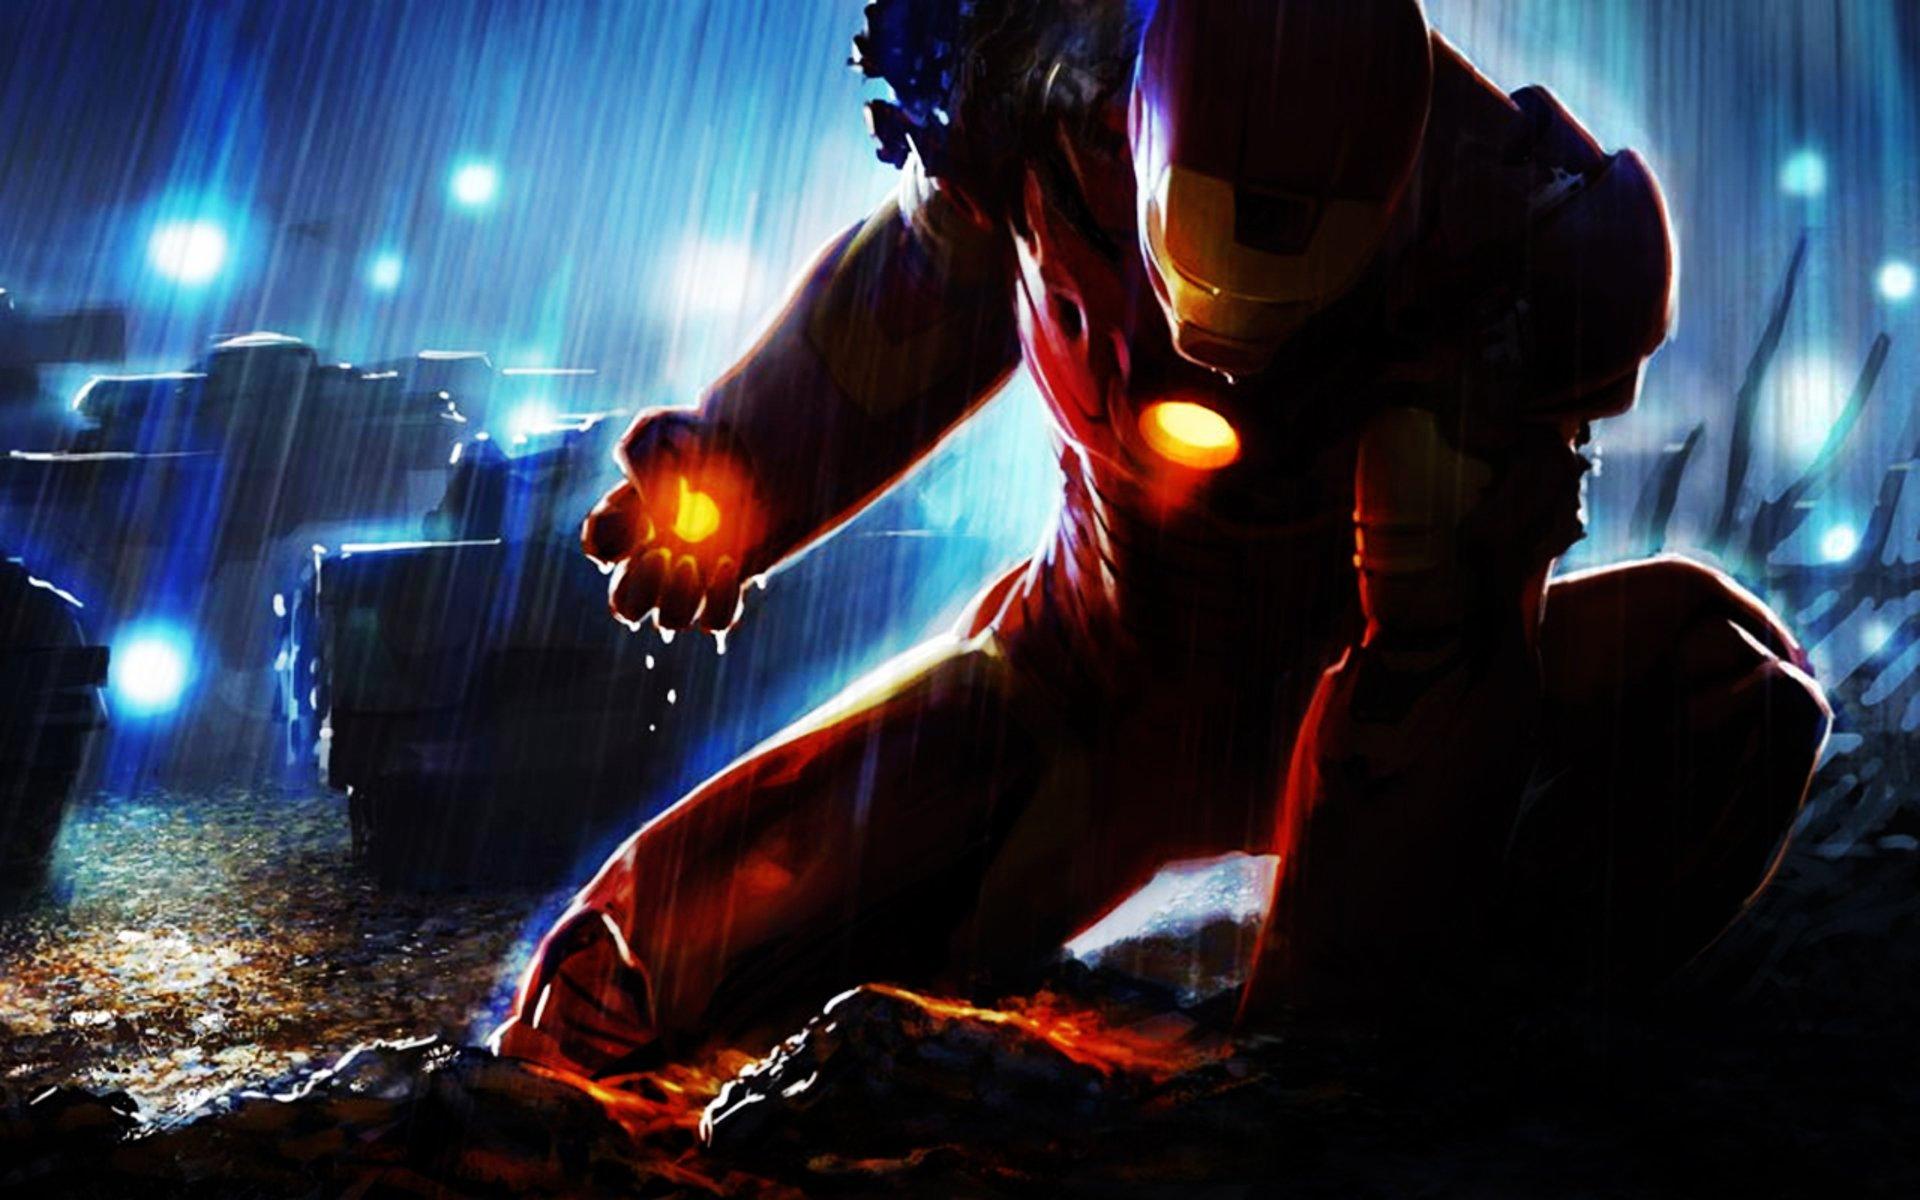 Free download Iron Man 4 Desktop HD Wallpaper Stylish HD